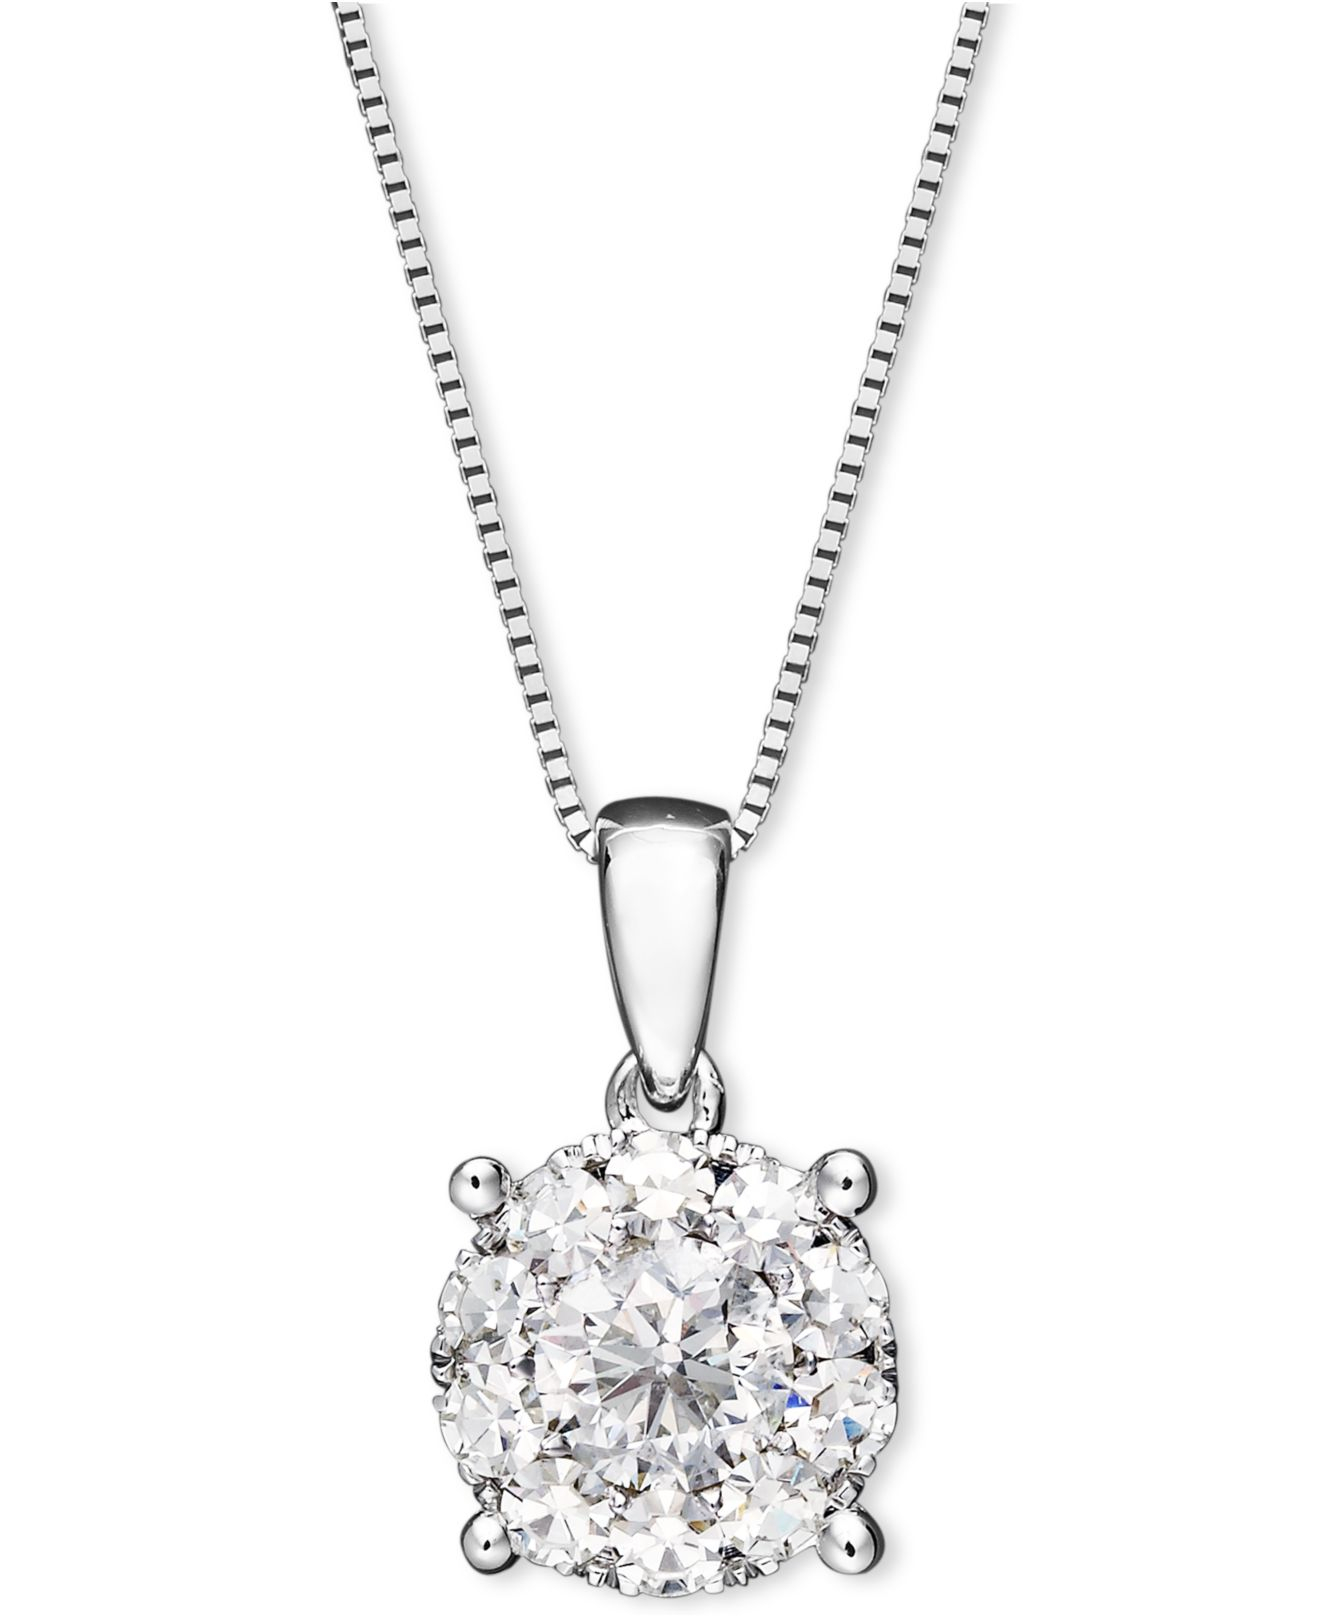 macy 39 s diamond pendant necklace in 14k white gold 1 2 ct. Black Bedroom Furniture Sets. Home Design Ideas